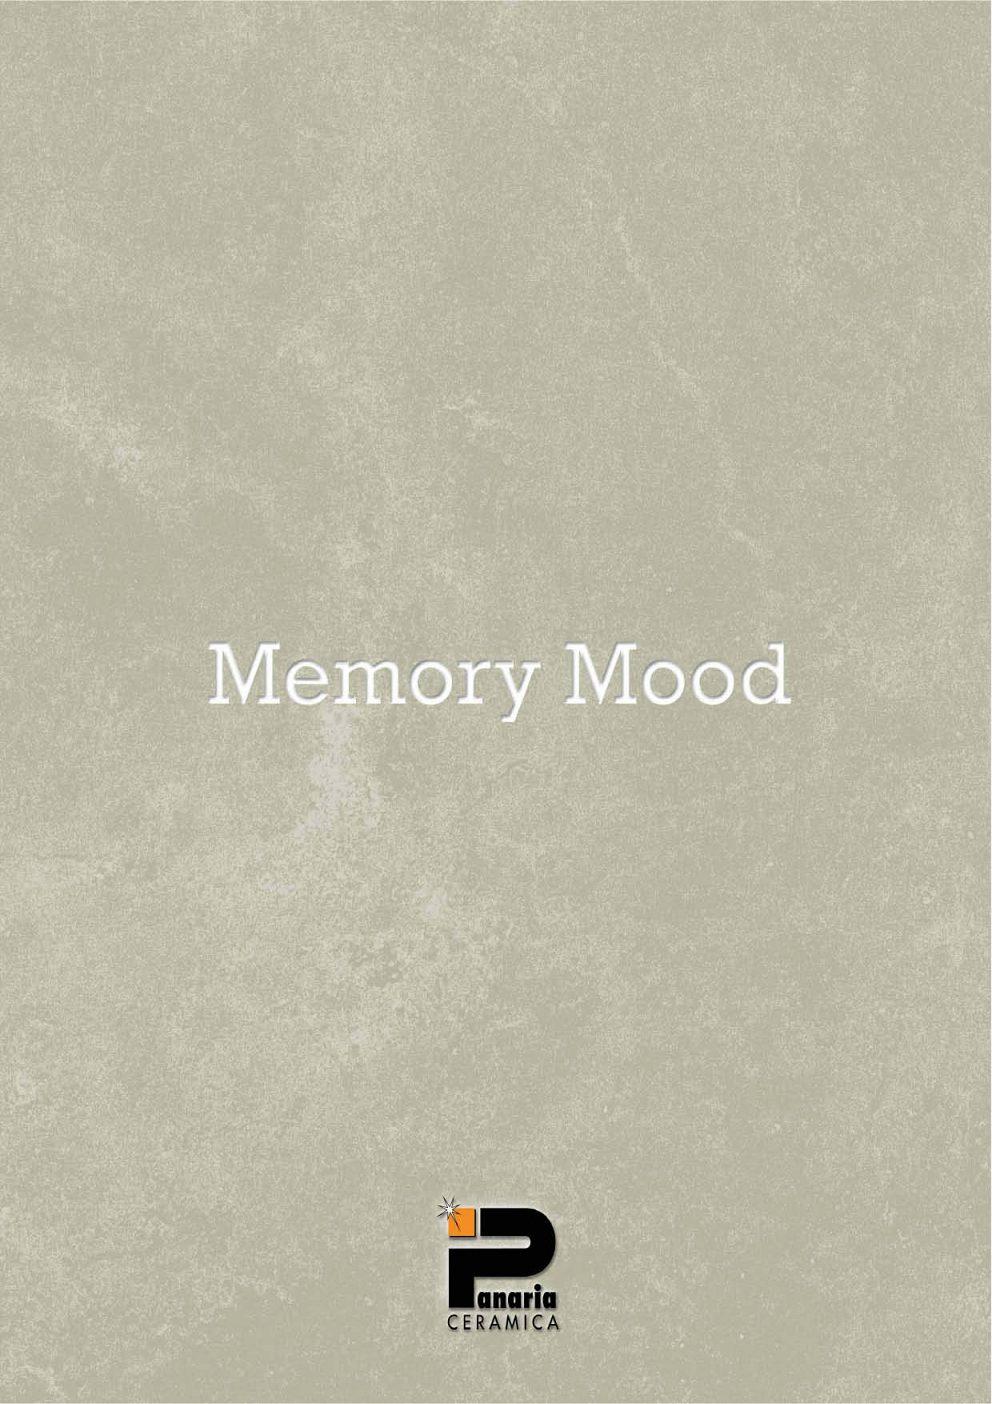 Panaria  - Memory Mood